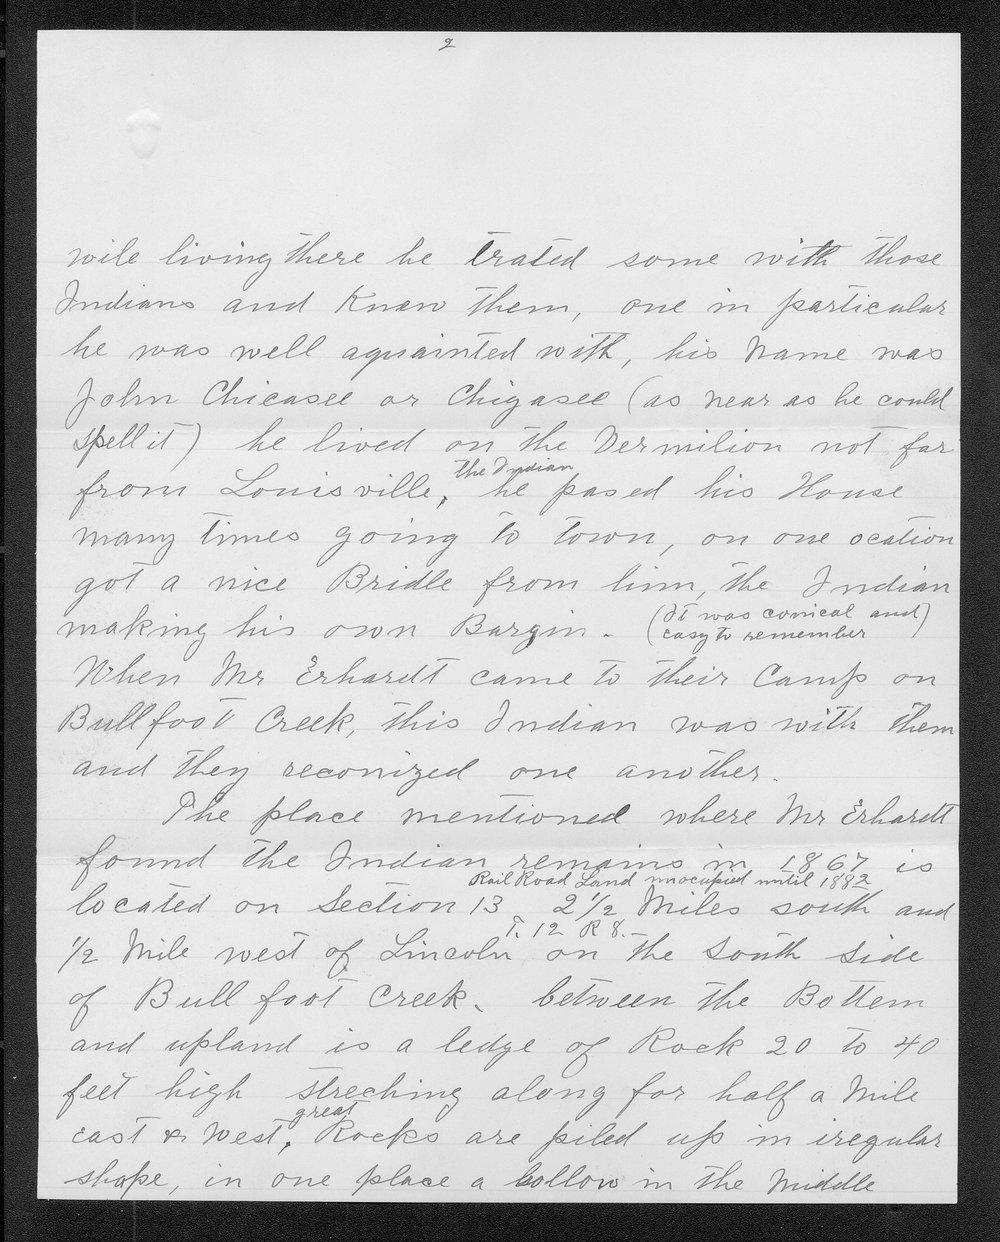 Adolph Roenigk and George W. Martin correspondence - 2